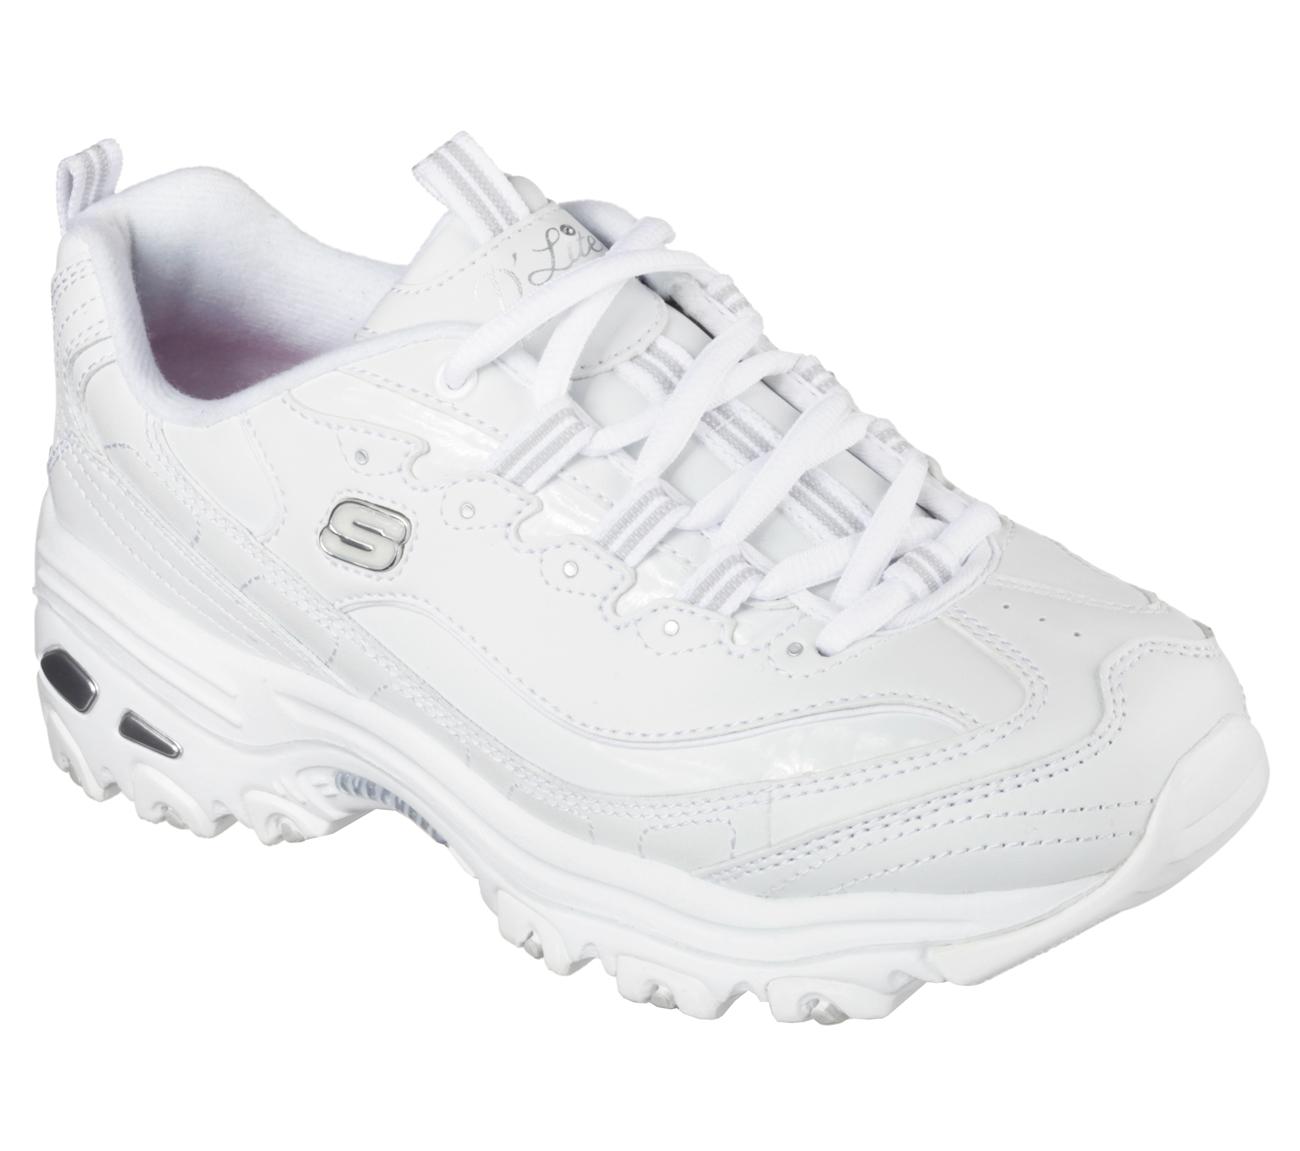 Boys Sketcher Light Shoes